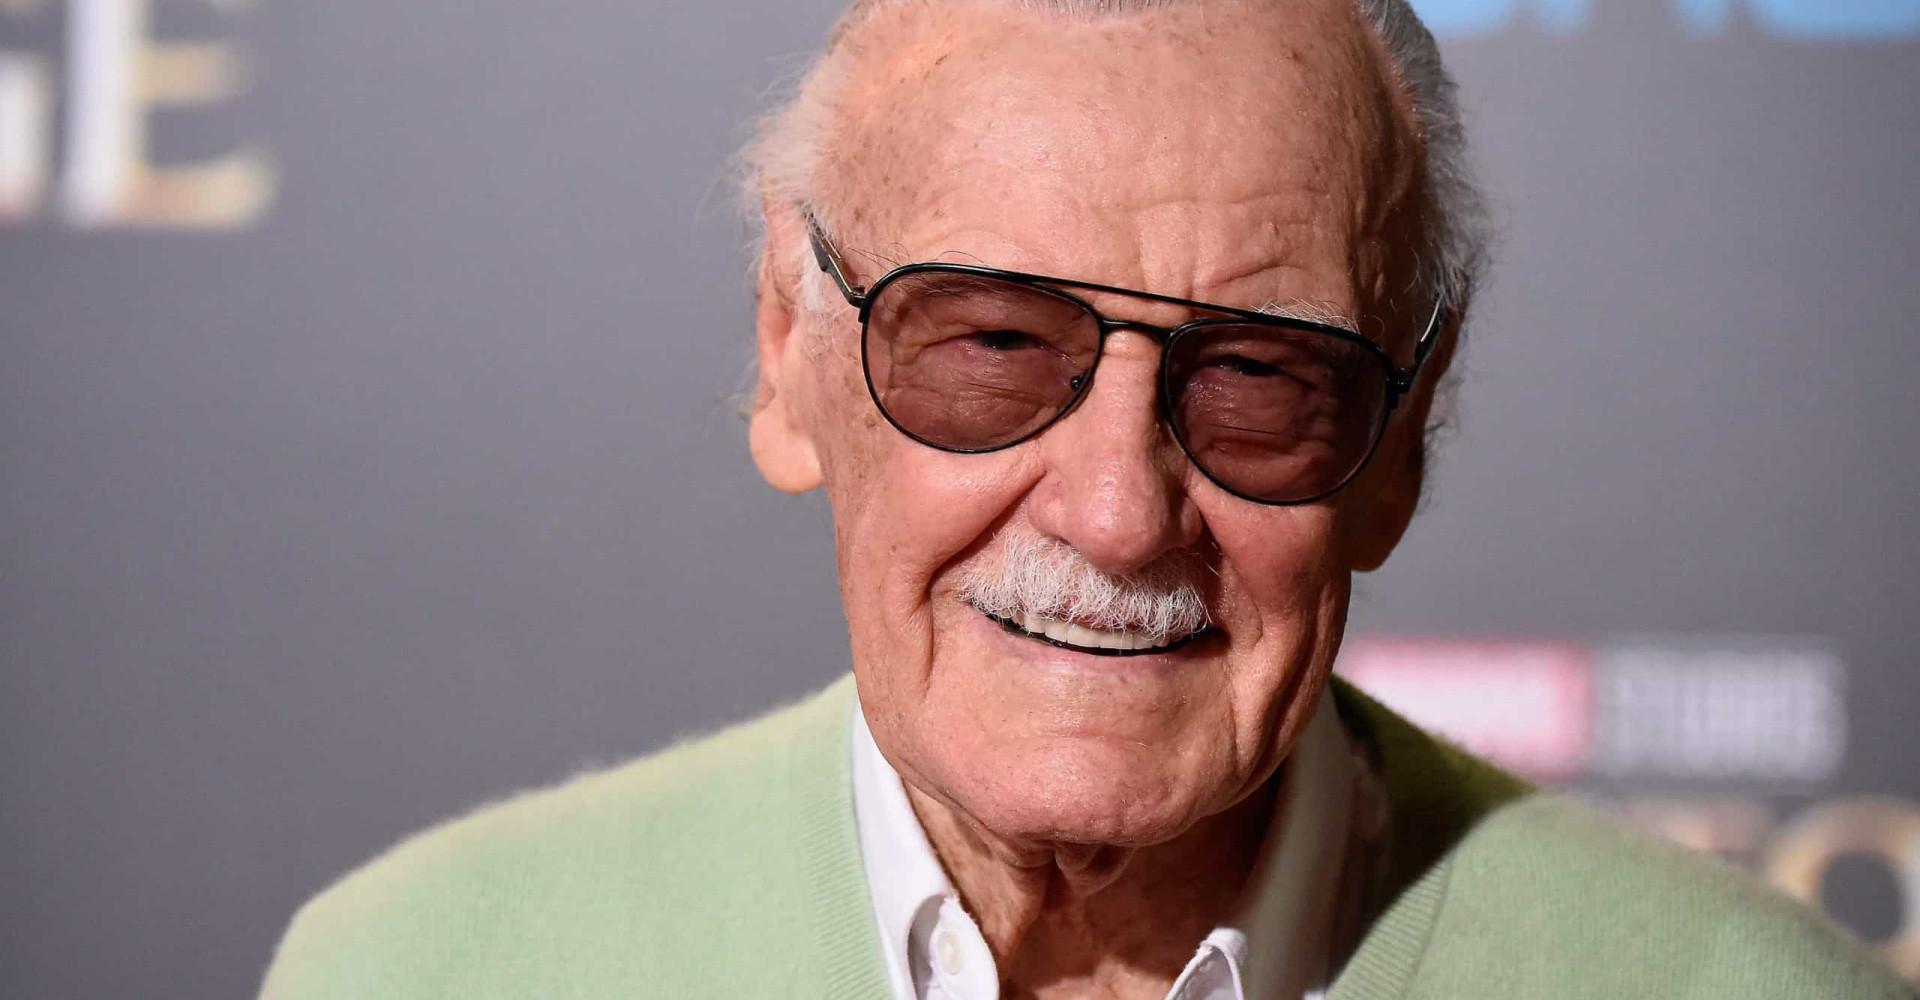 Remembering Stan Lee on his birthday